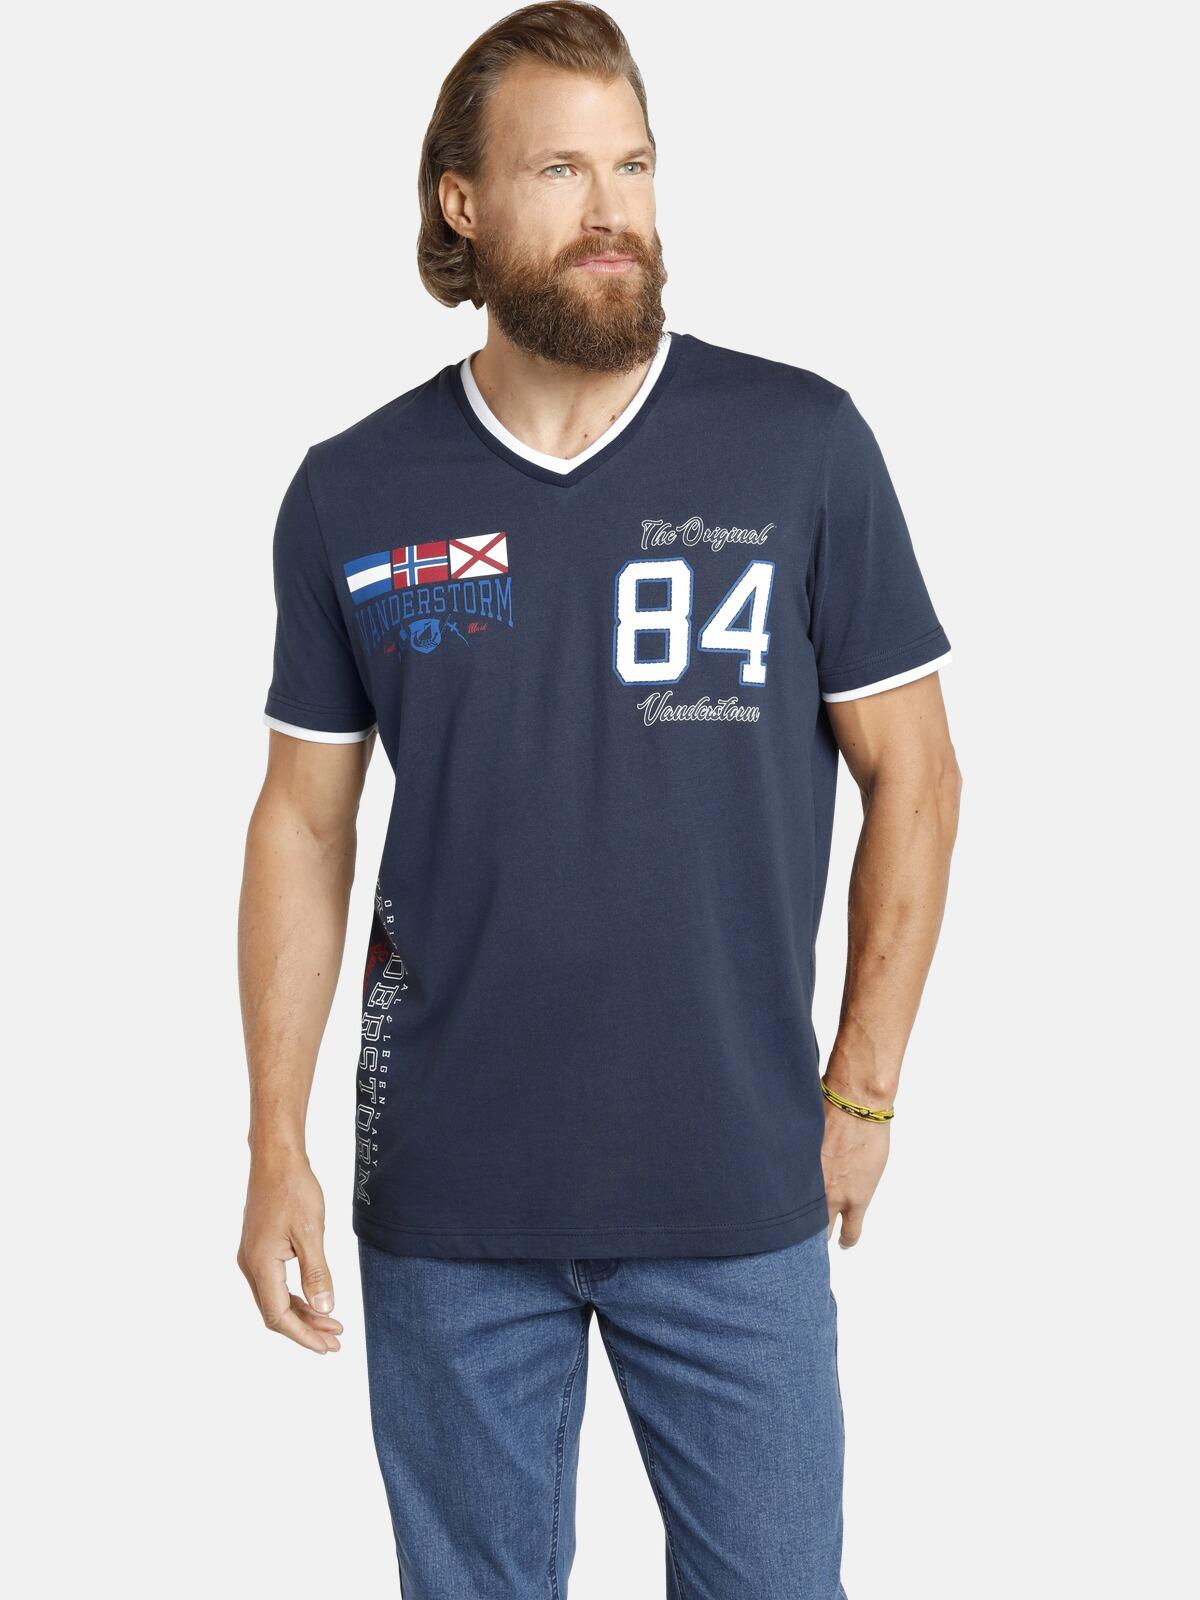 jan vanderstorm -  V-Shirt SANNO, Doppellagen-Look, Comfort Fit